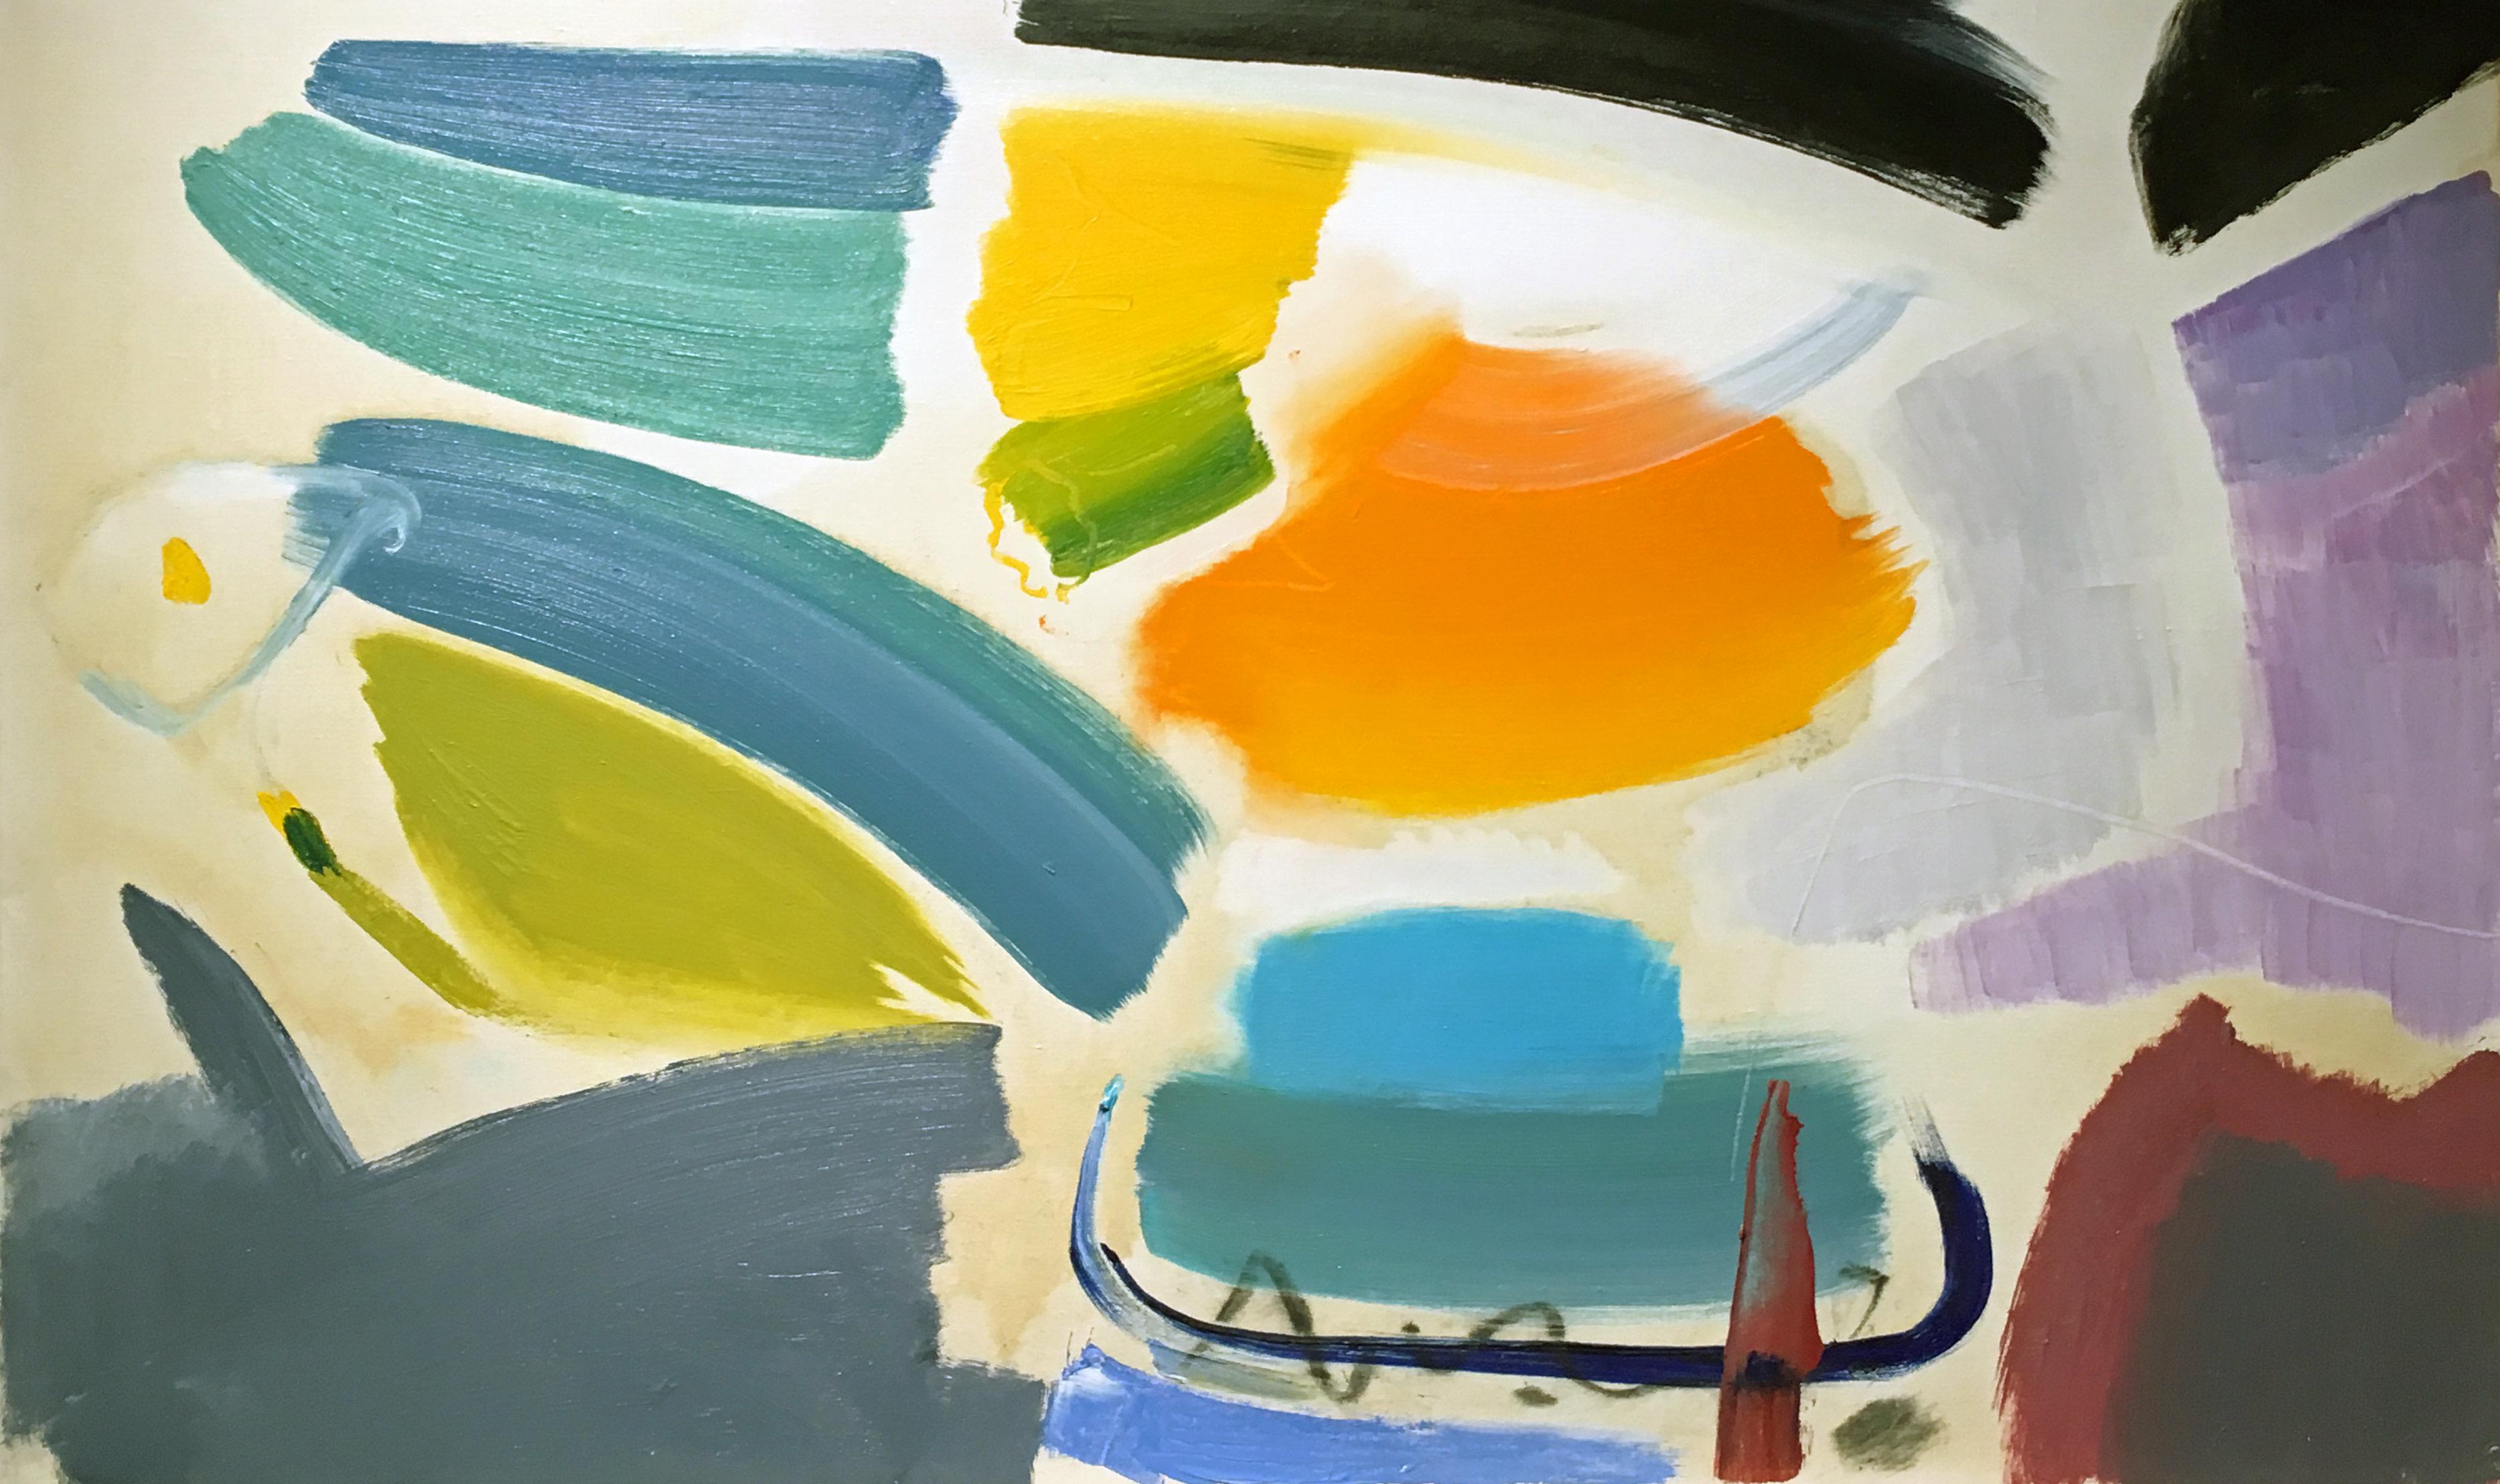 Ivon Hitchens 1893-1979 Calla Lilies, 1967 oil on canvas 36 x 22 in / 91.5 x 56 cm